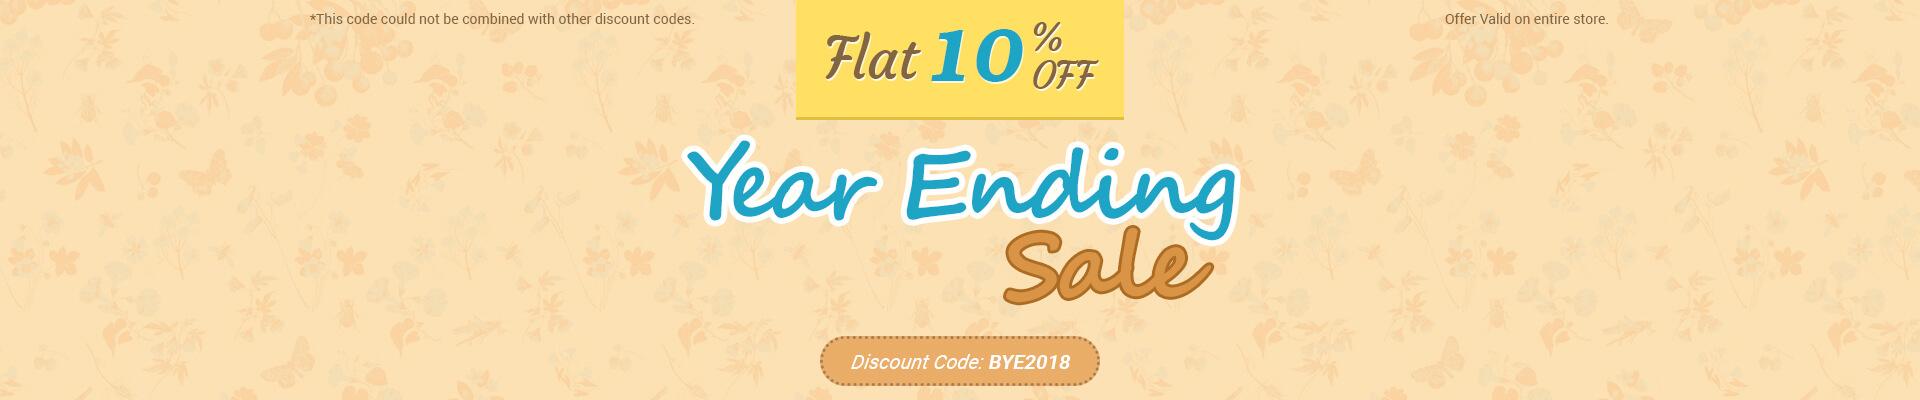 Year Ending Sale